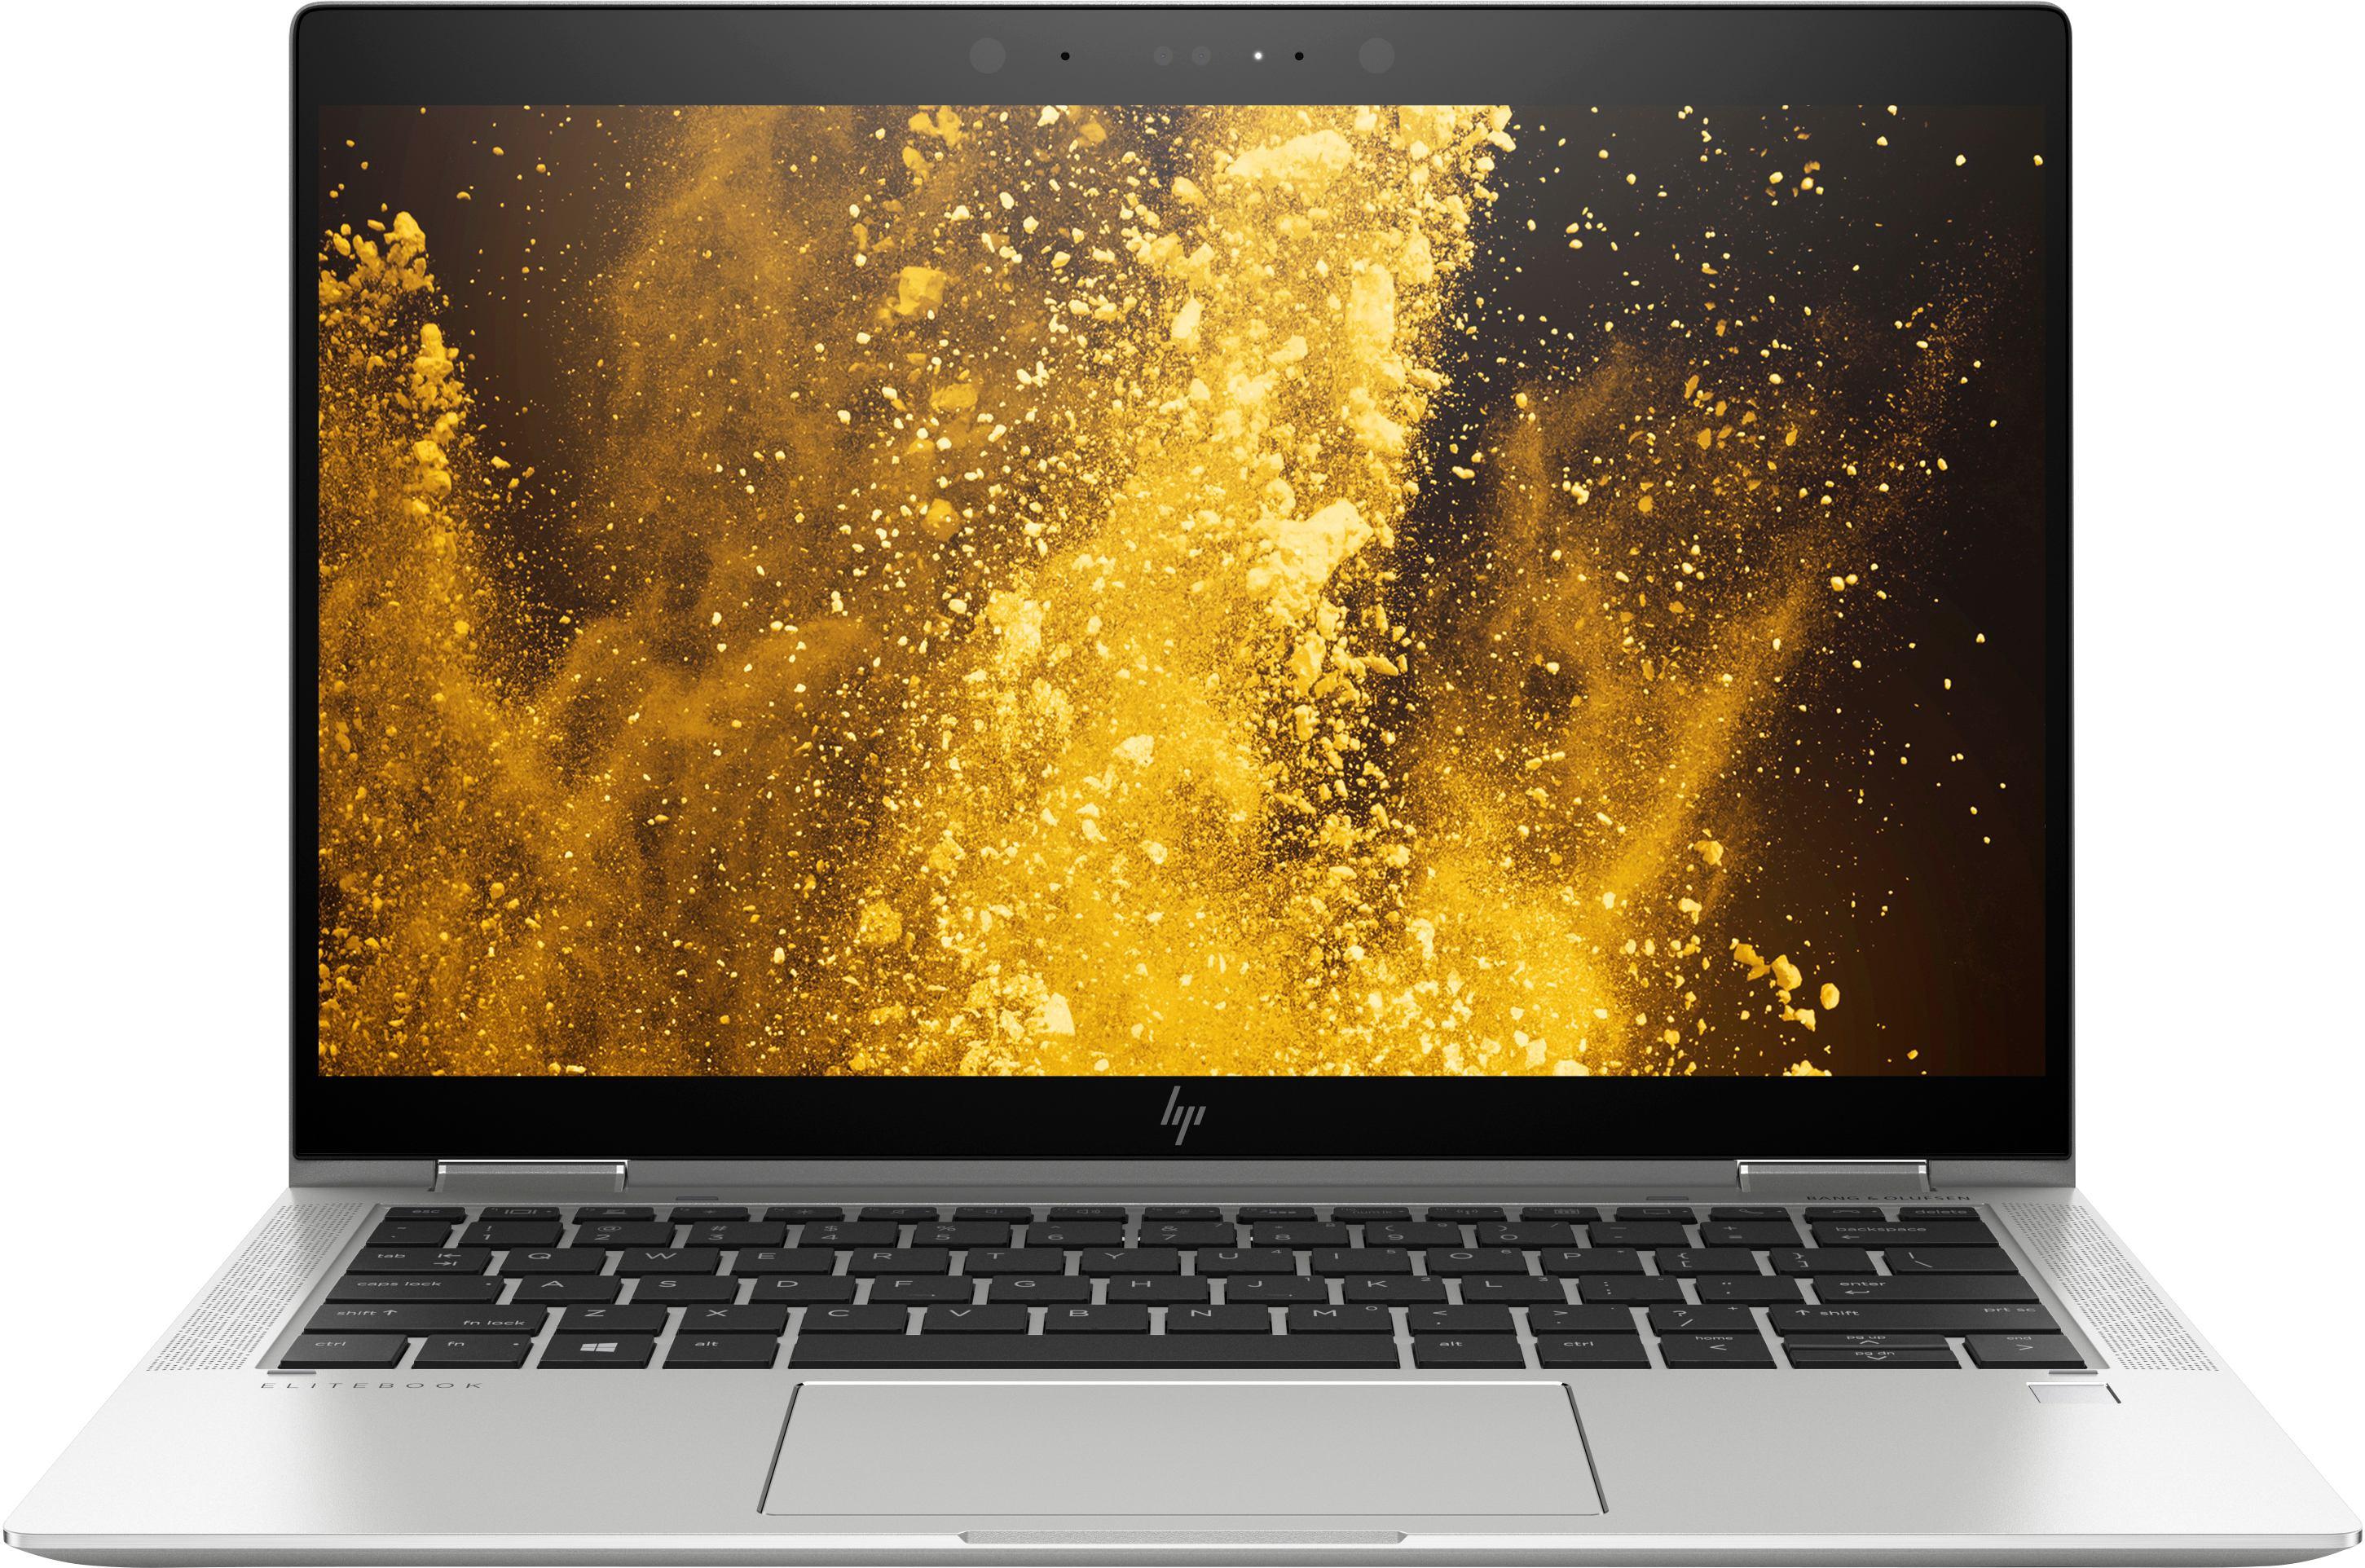 2022274-HP-EliteBook-x360-1030-G3-Argento-Ibrido-2-in-1-33-8-cm-13-3-1920-x